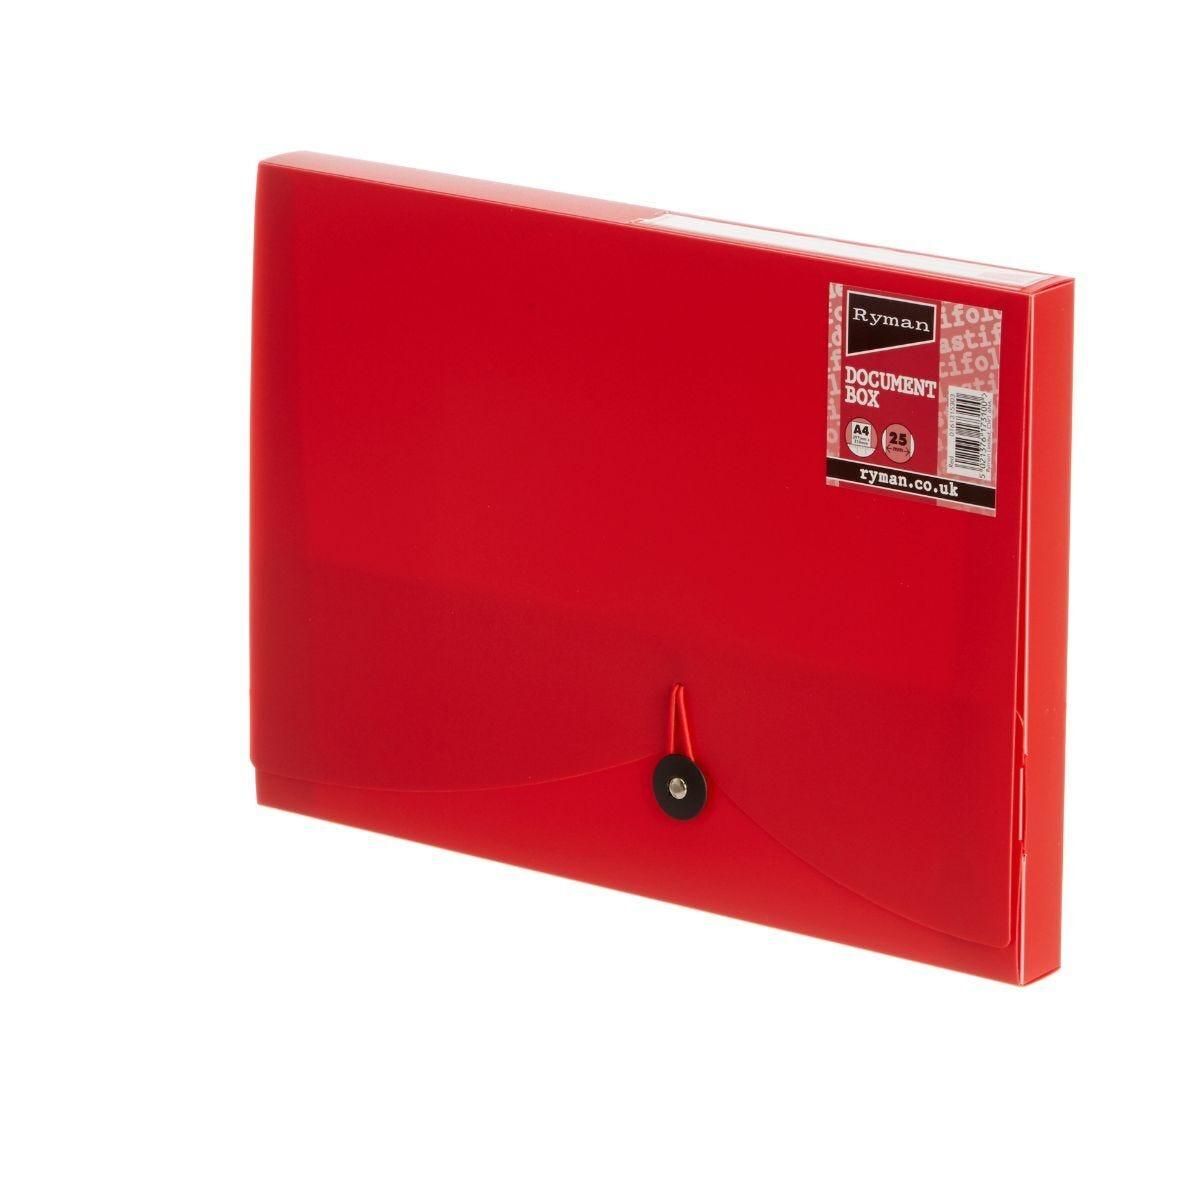 Ryman Document Box 25mm Red